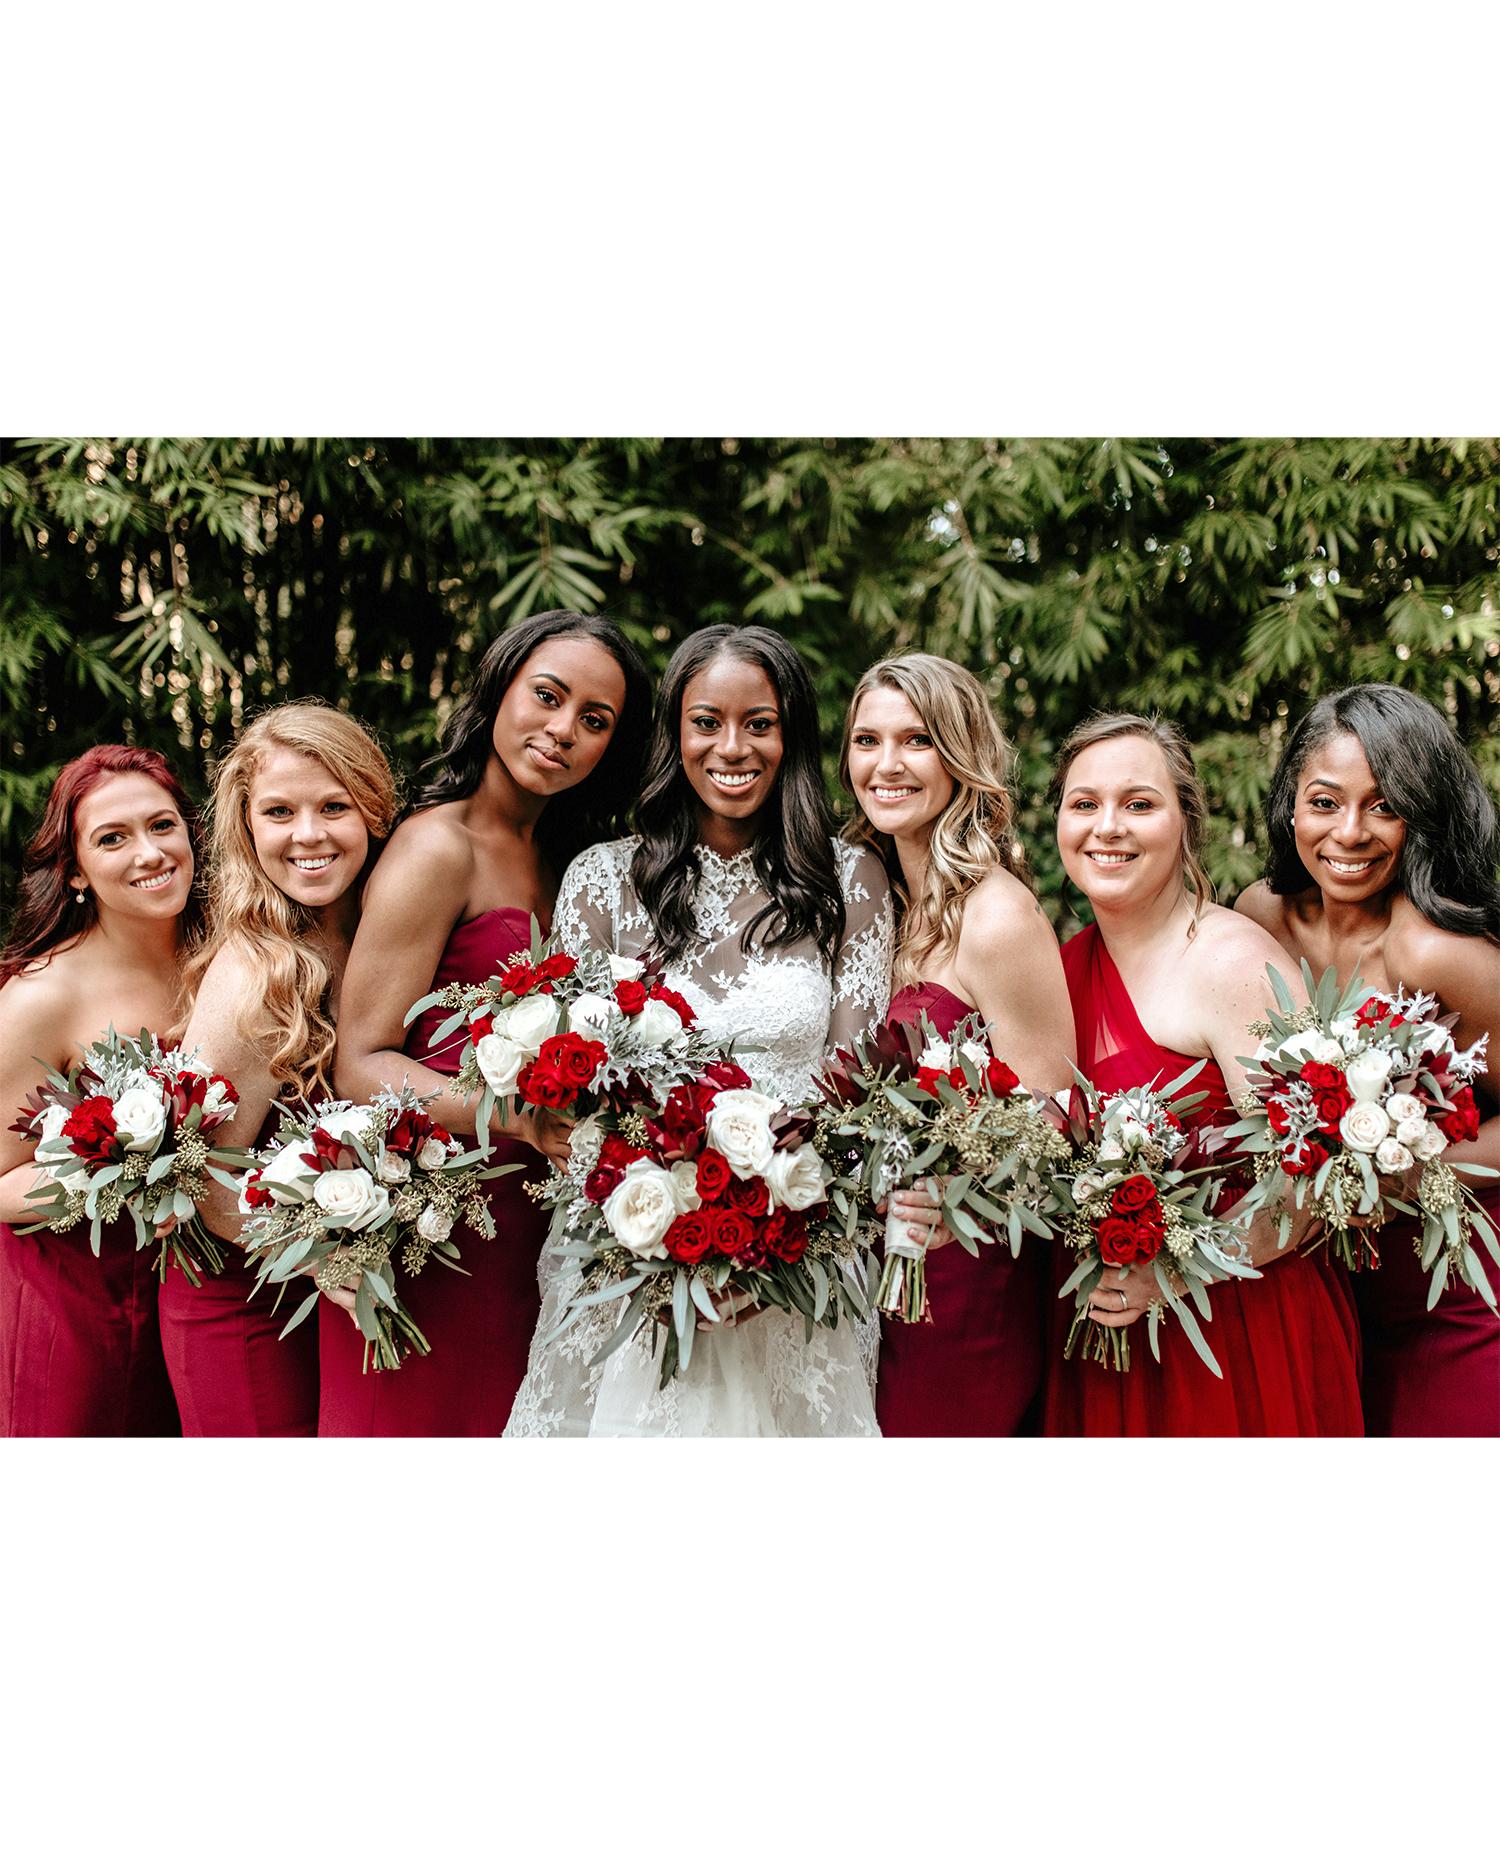 aerielle dyan wedding bridesmaids in red dresses